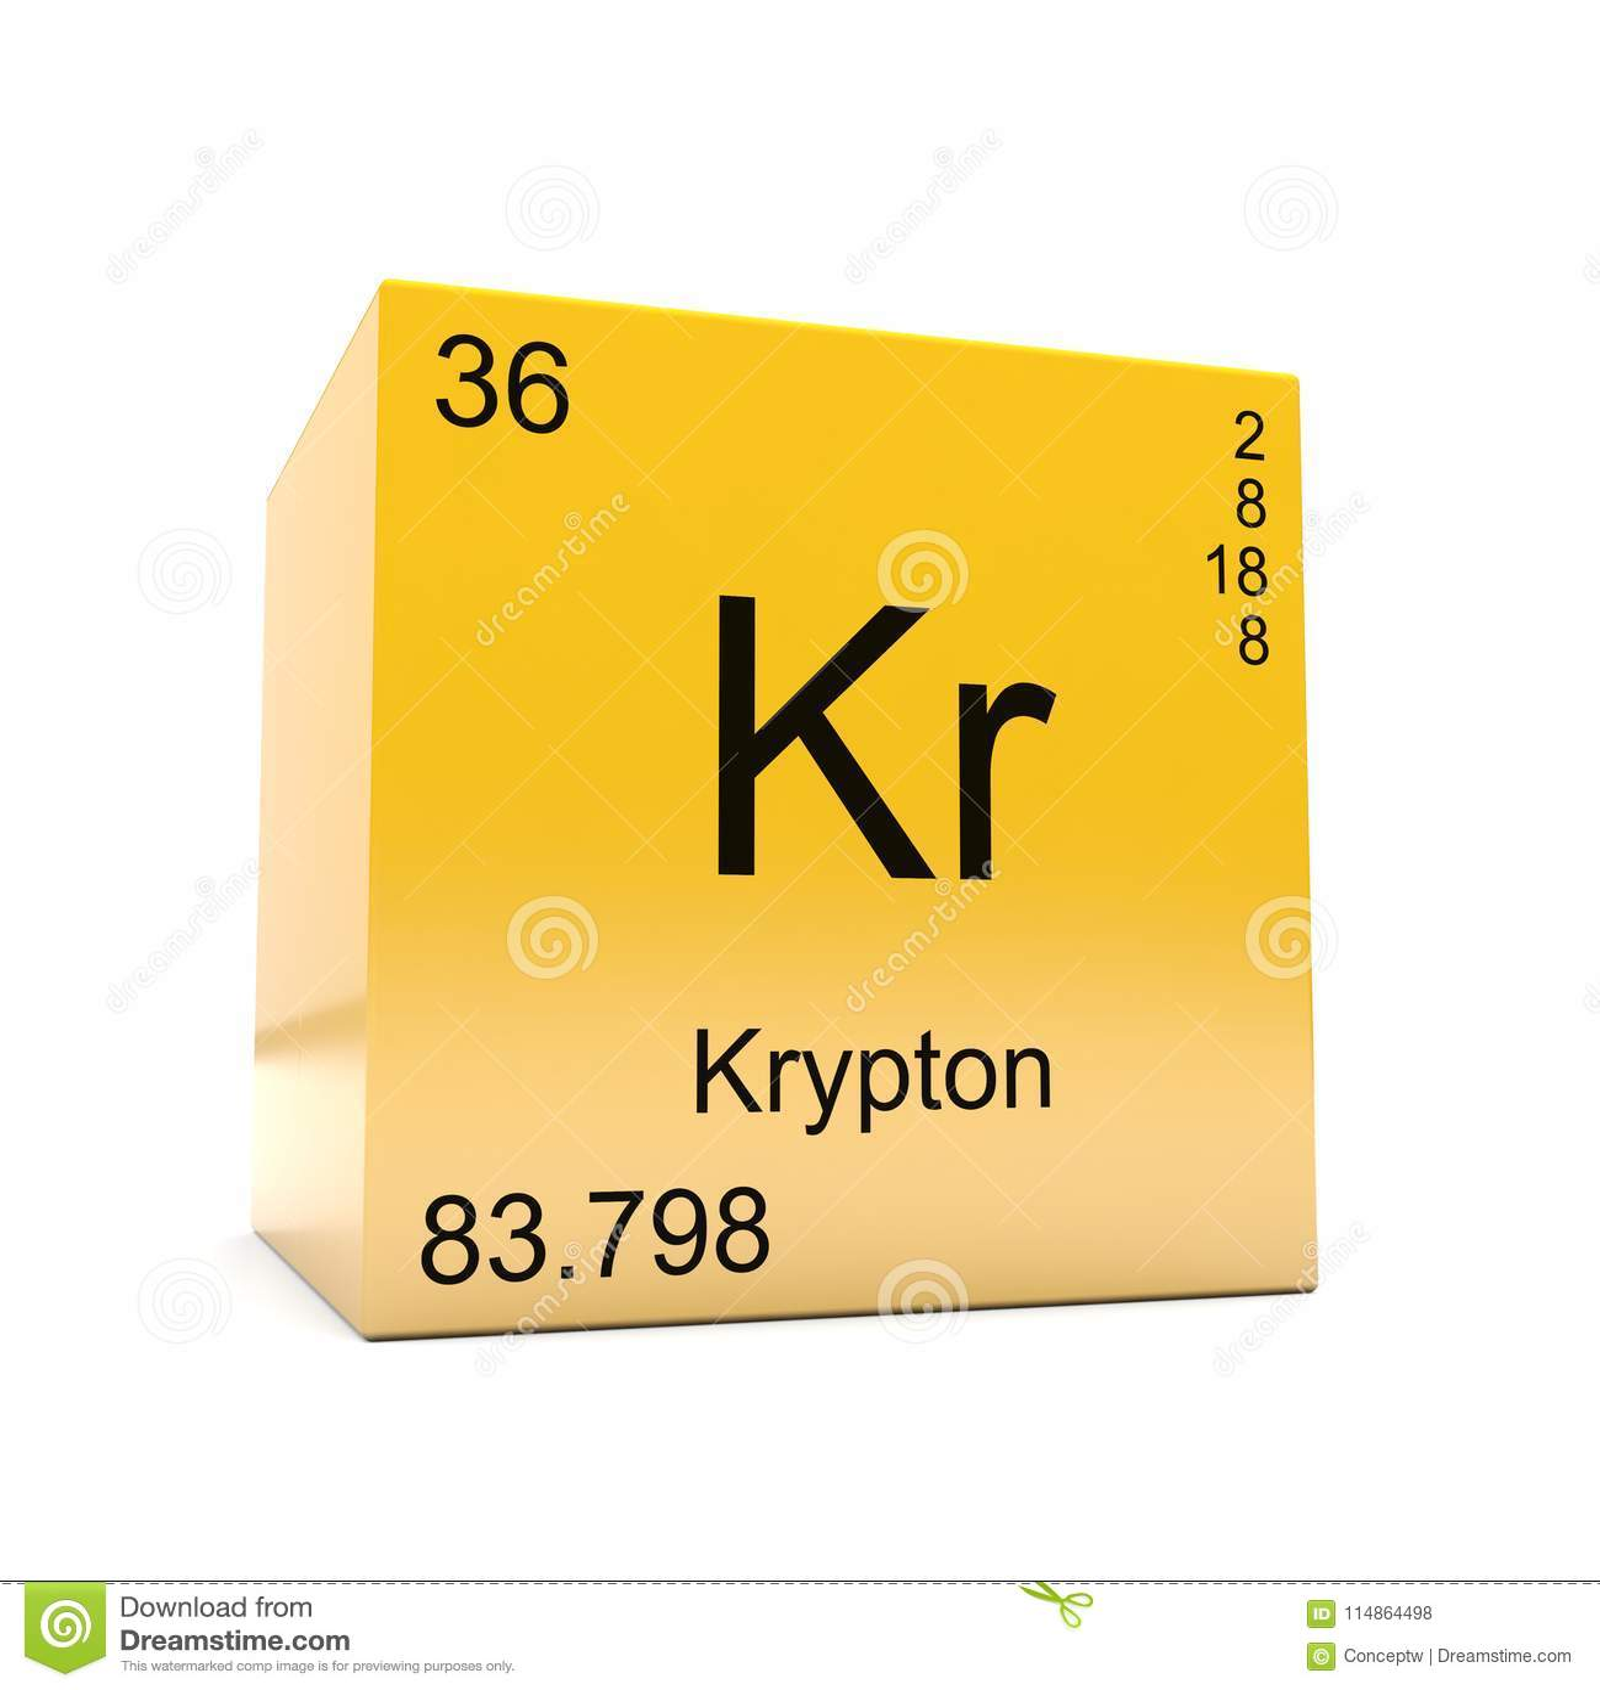 Krypton chemical element symbol from periodic table stock download krypton chemical element symbol from periodic table stock illustration illustration of science symbol urtaz Choice Image